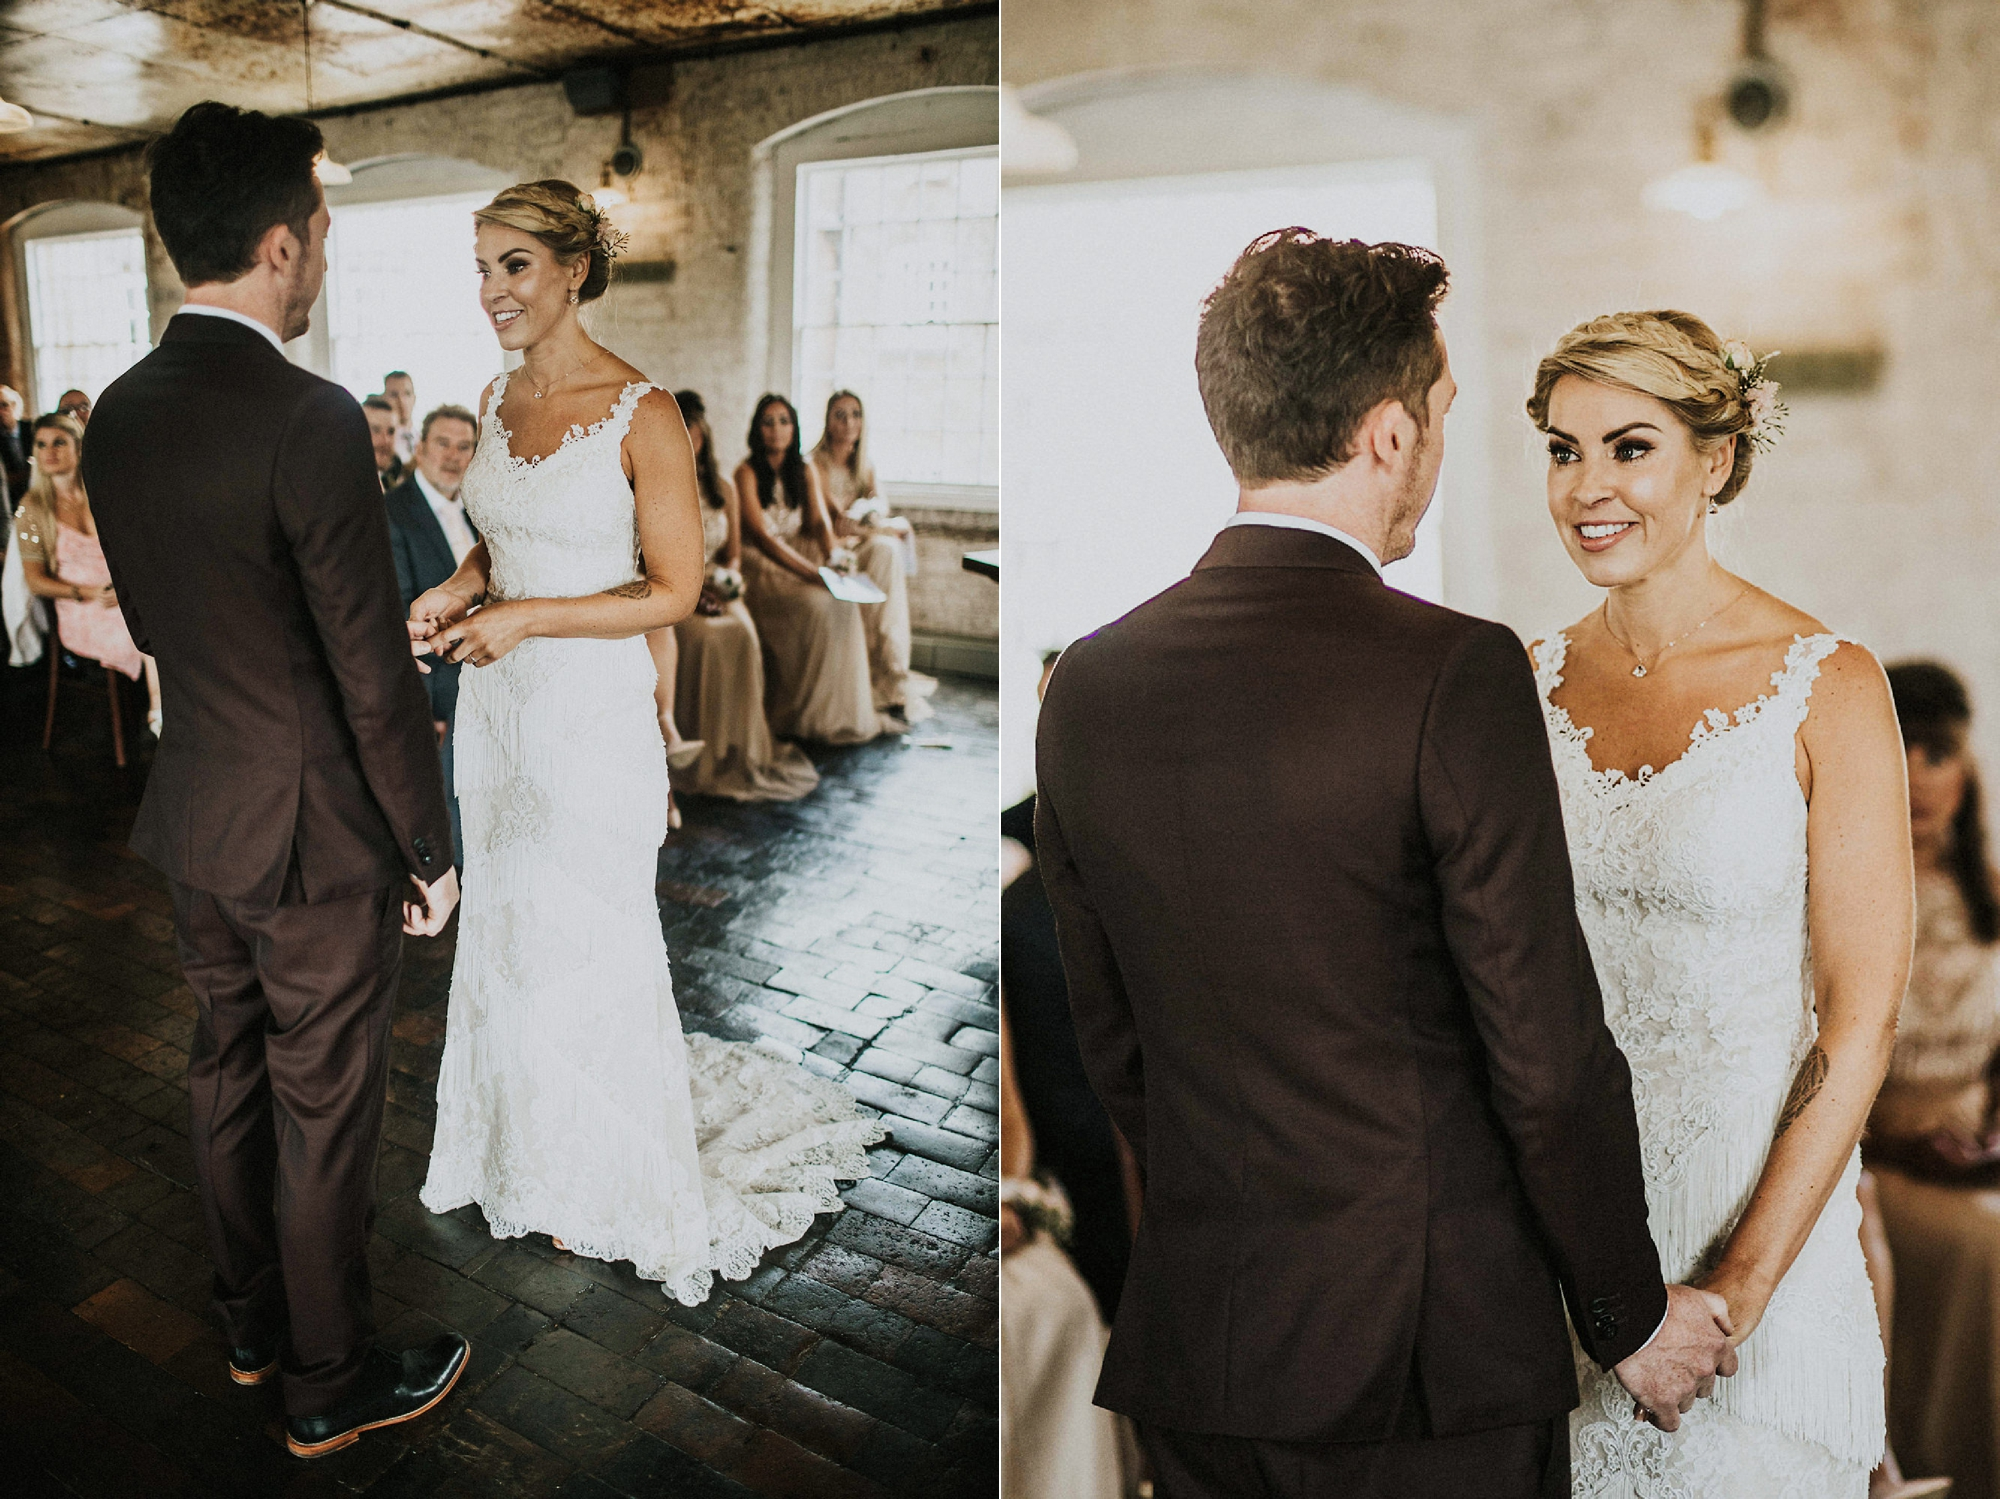 the_west_mill_derby_wedding_photographer_042.1.jpg